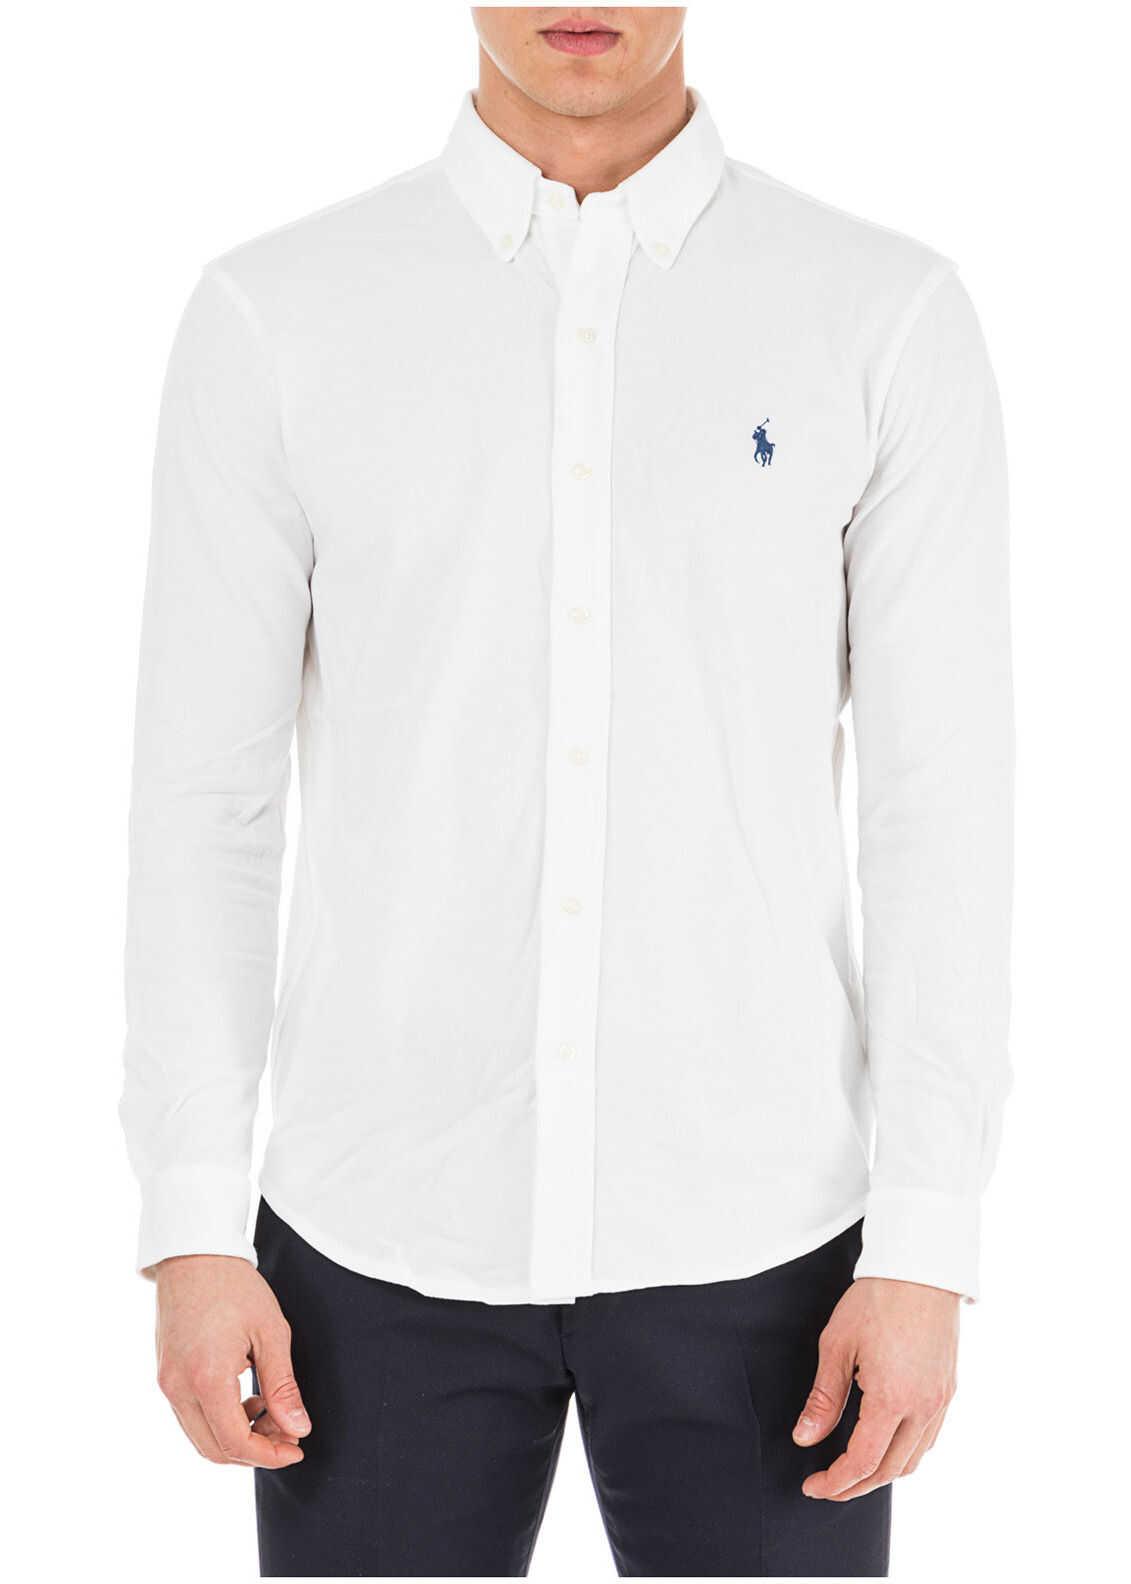 Ralph Lauren Dress Shirt White imagine